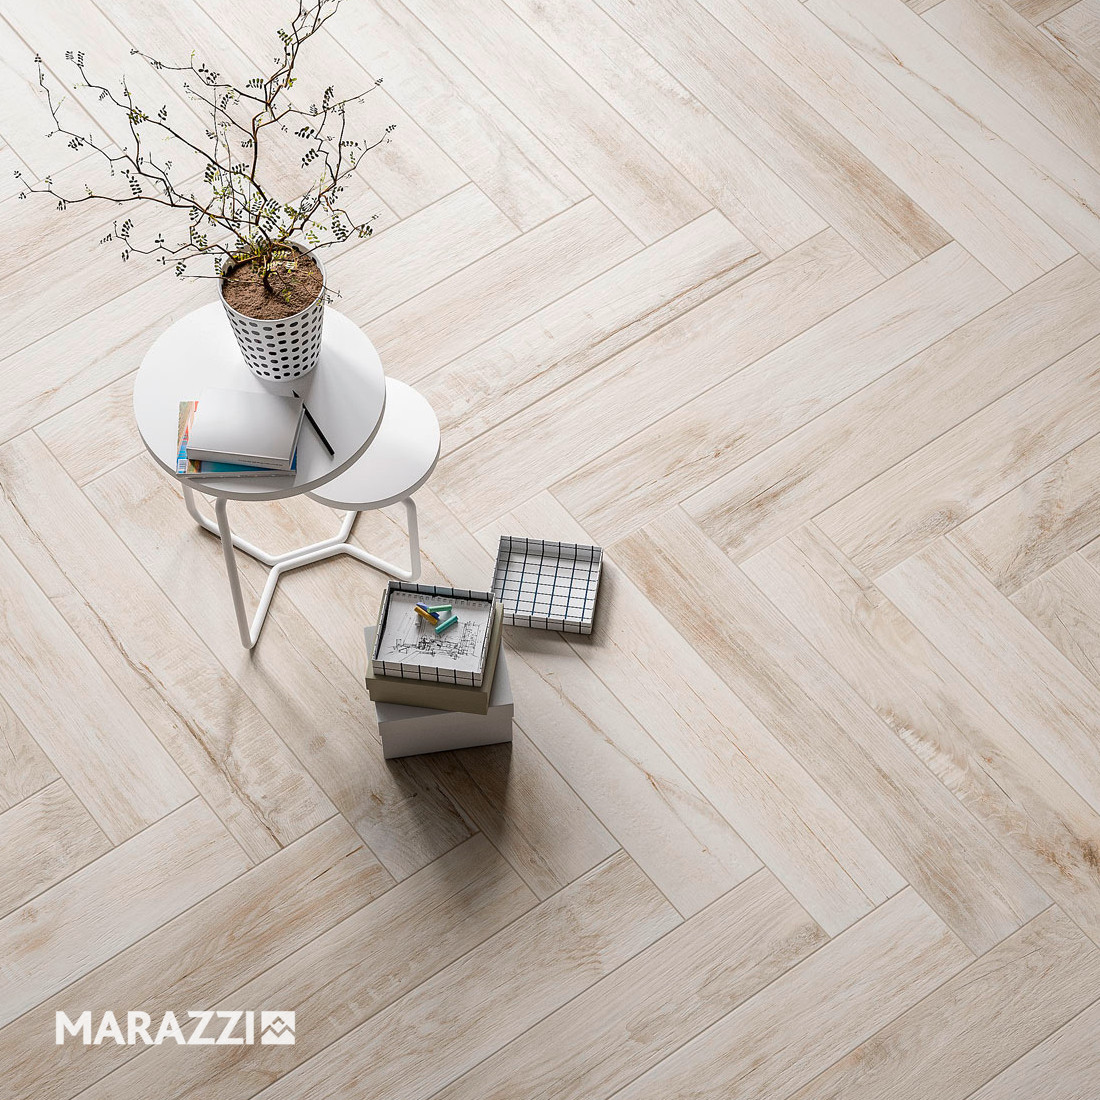 Marazzi Treverkmade